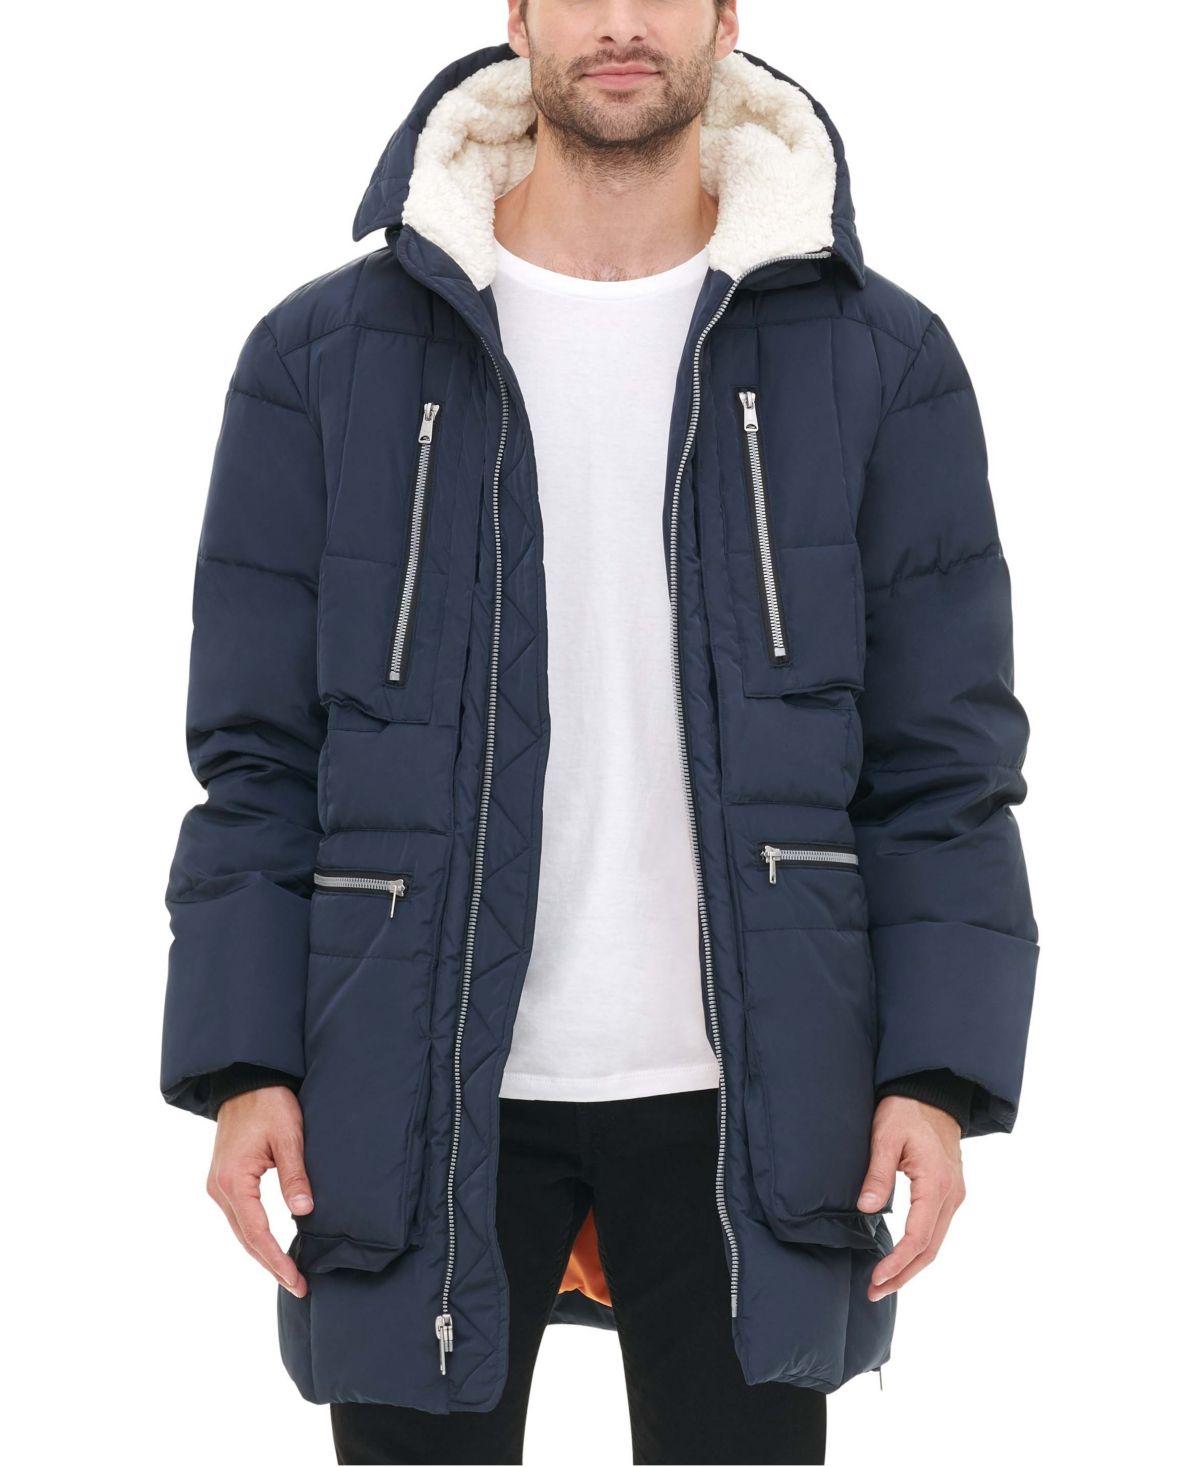 Tommy Hilfiger Men S Hooded Parka Jacket Reviews Coats Jackets Men Macy S Parka Jacket Women Hooded Parka Jacket Parka Jacket [ 1467 x 1200 Pixel ]